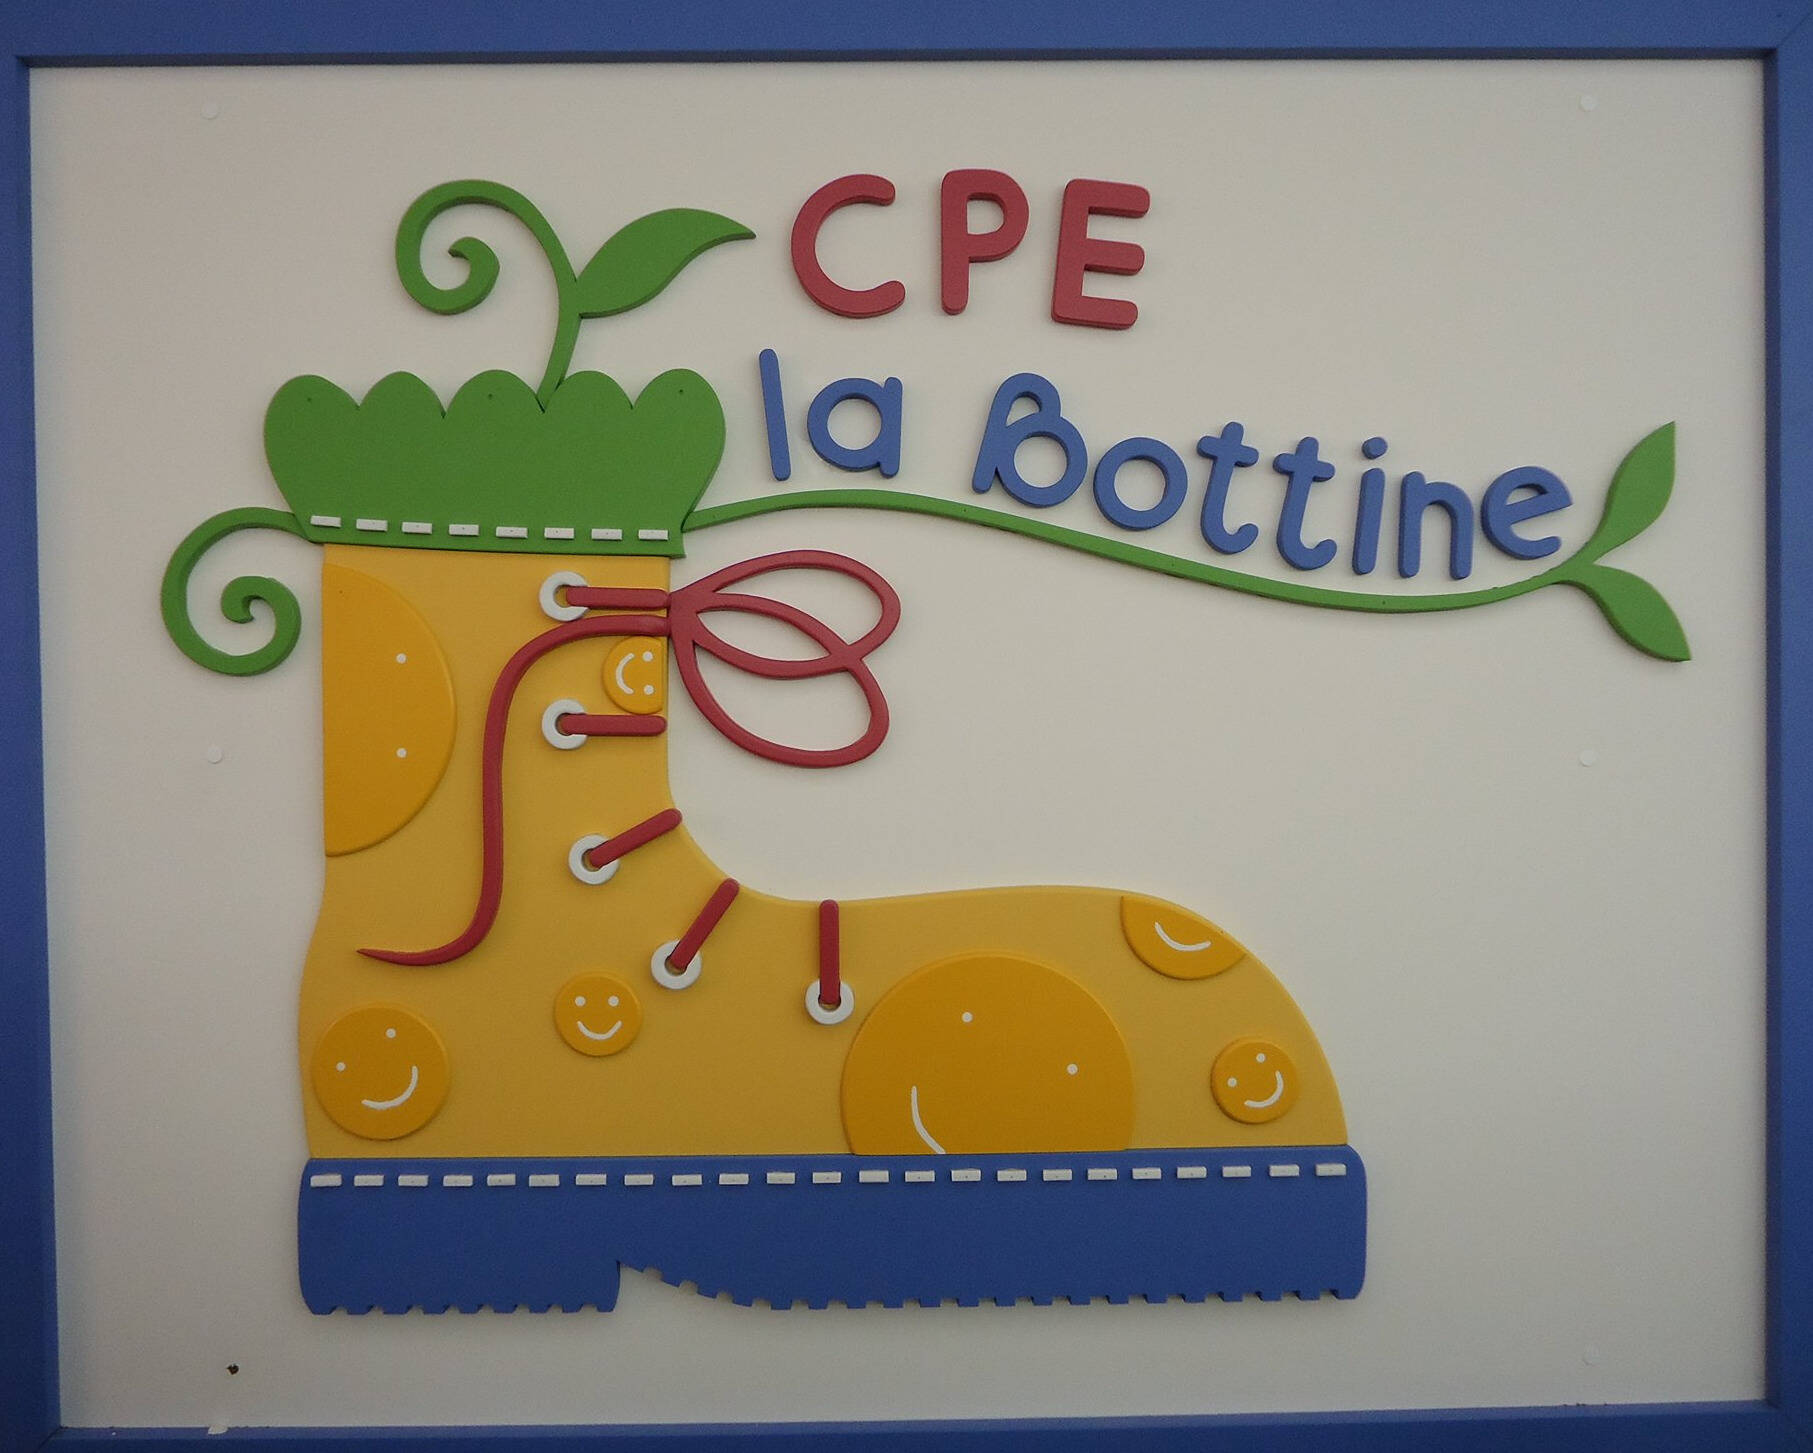 CPE La Bottine